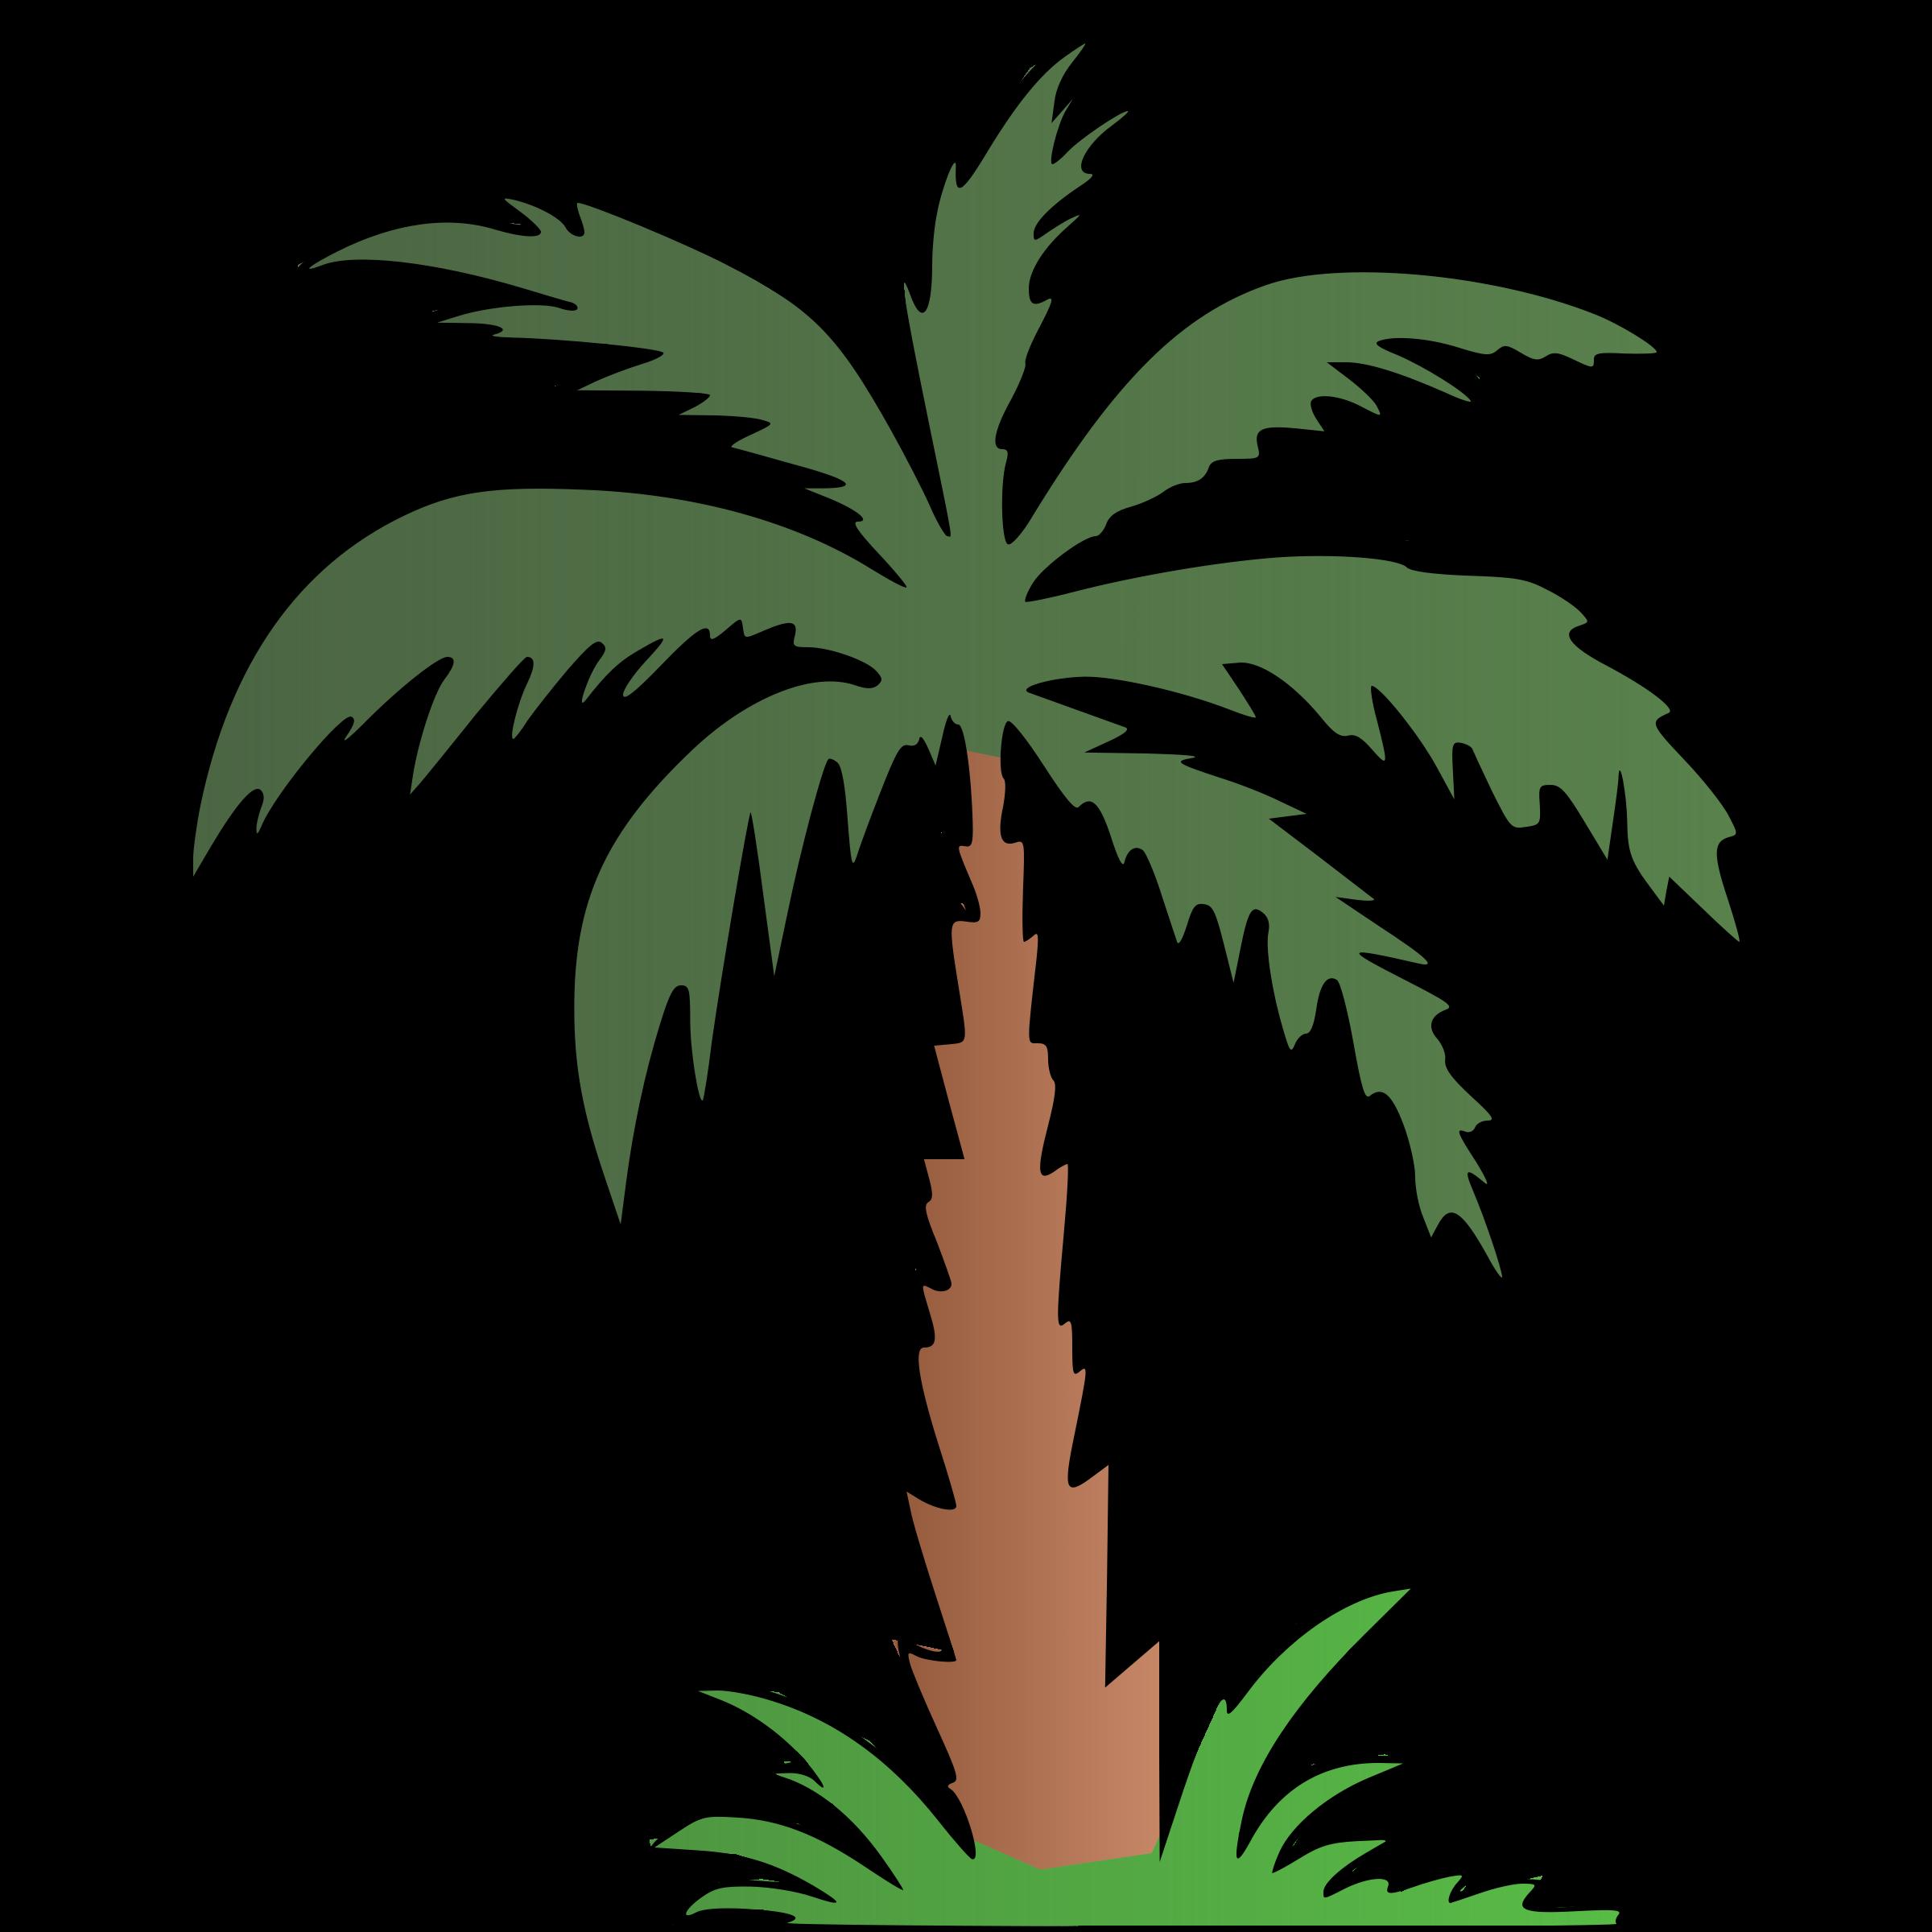 Tree clipart colour. Palm big image png